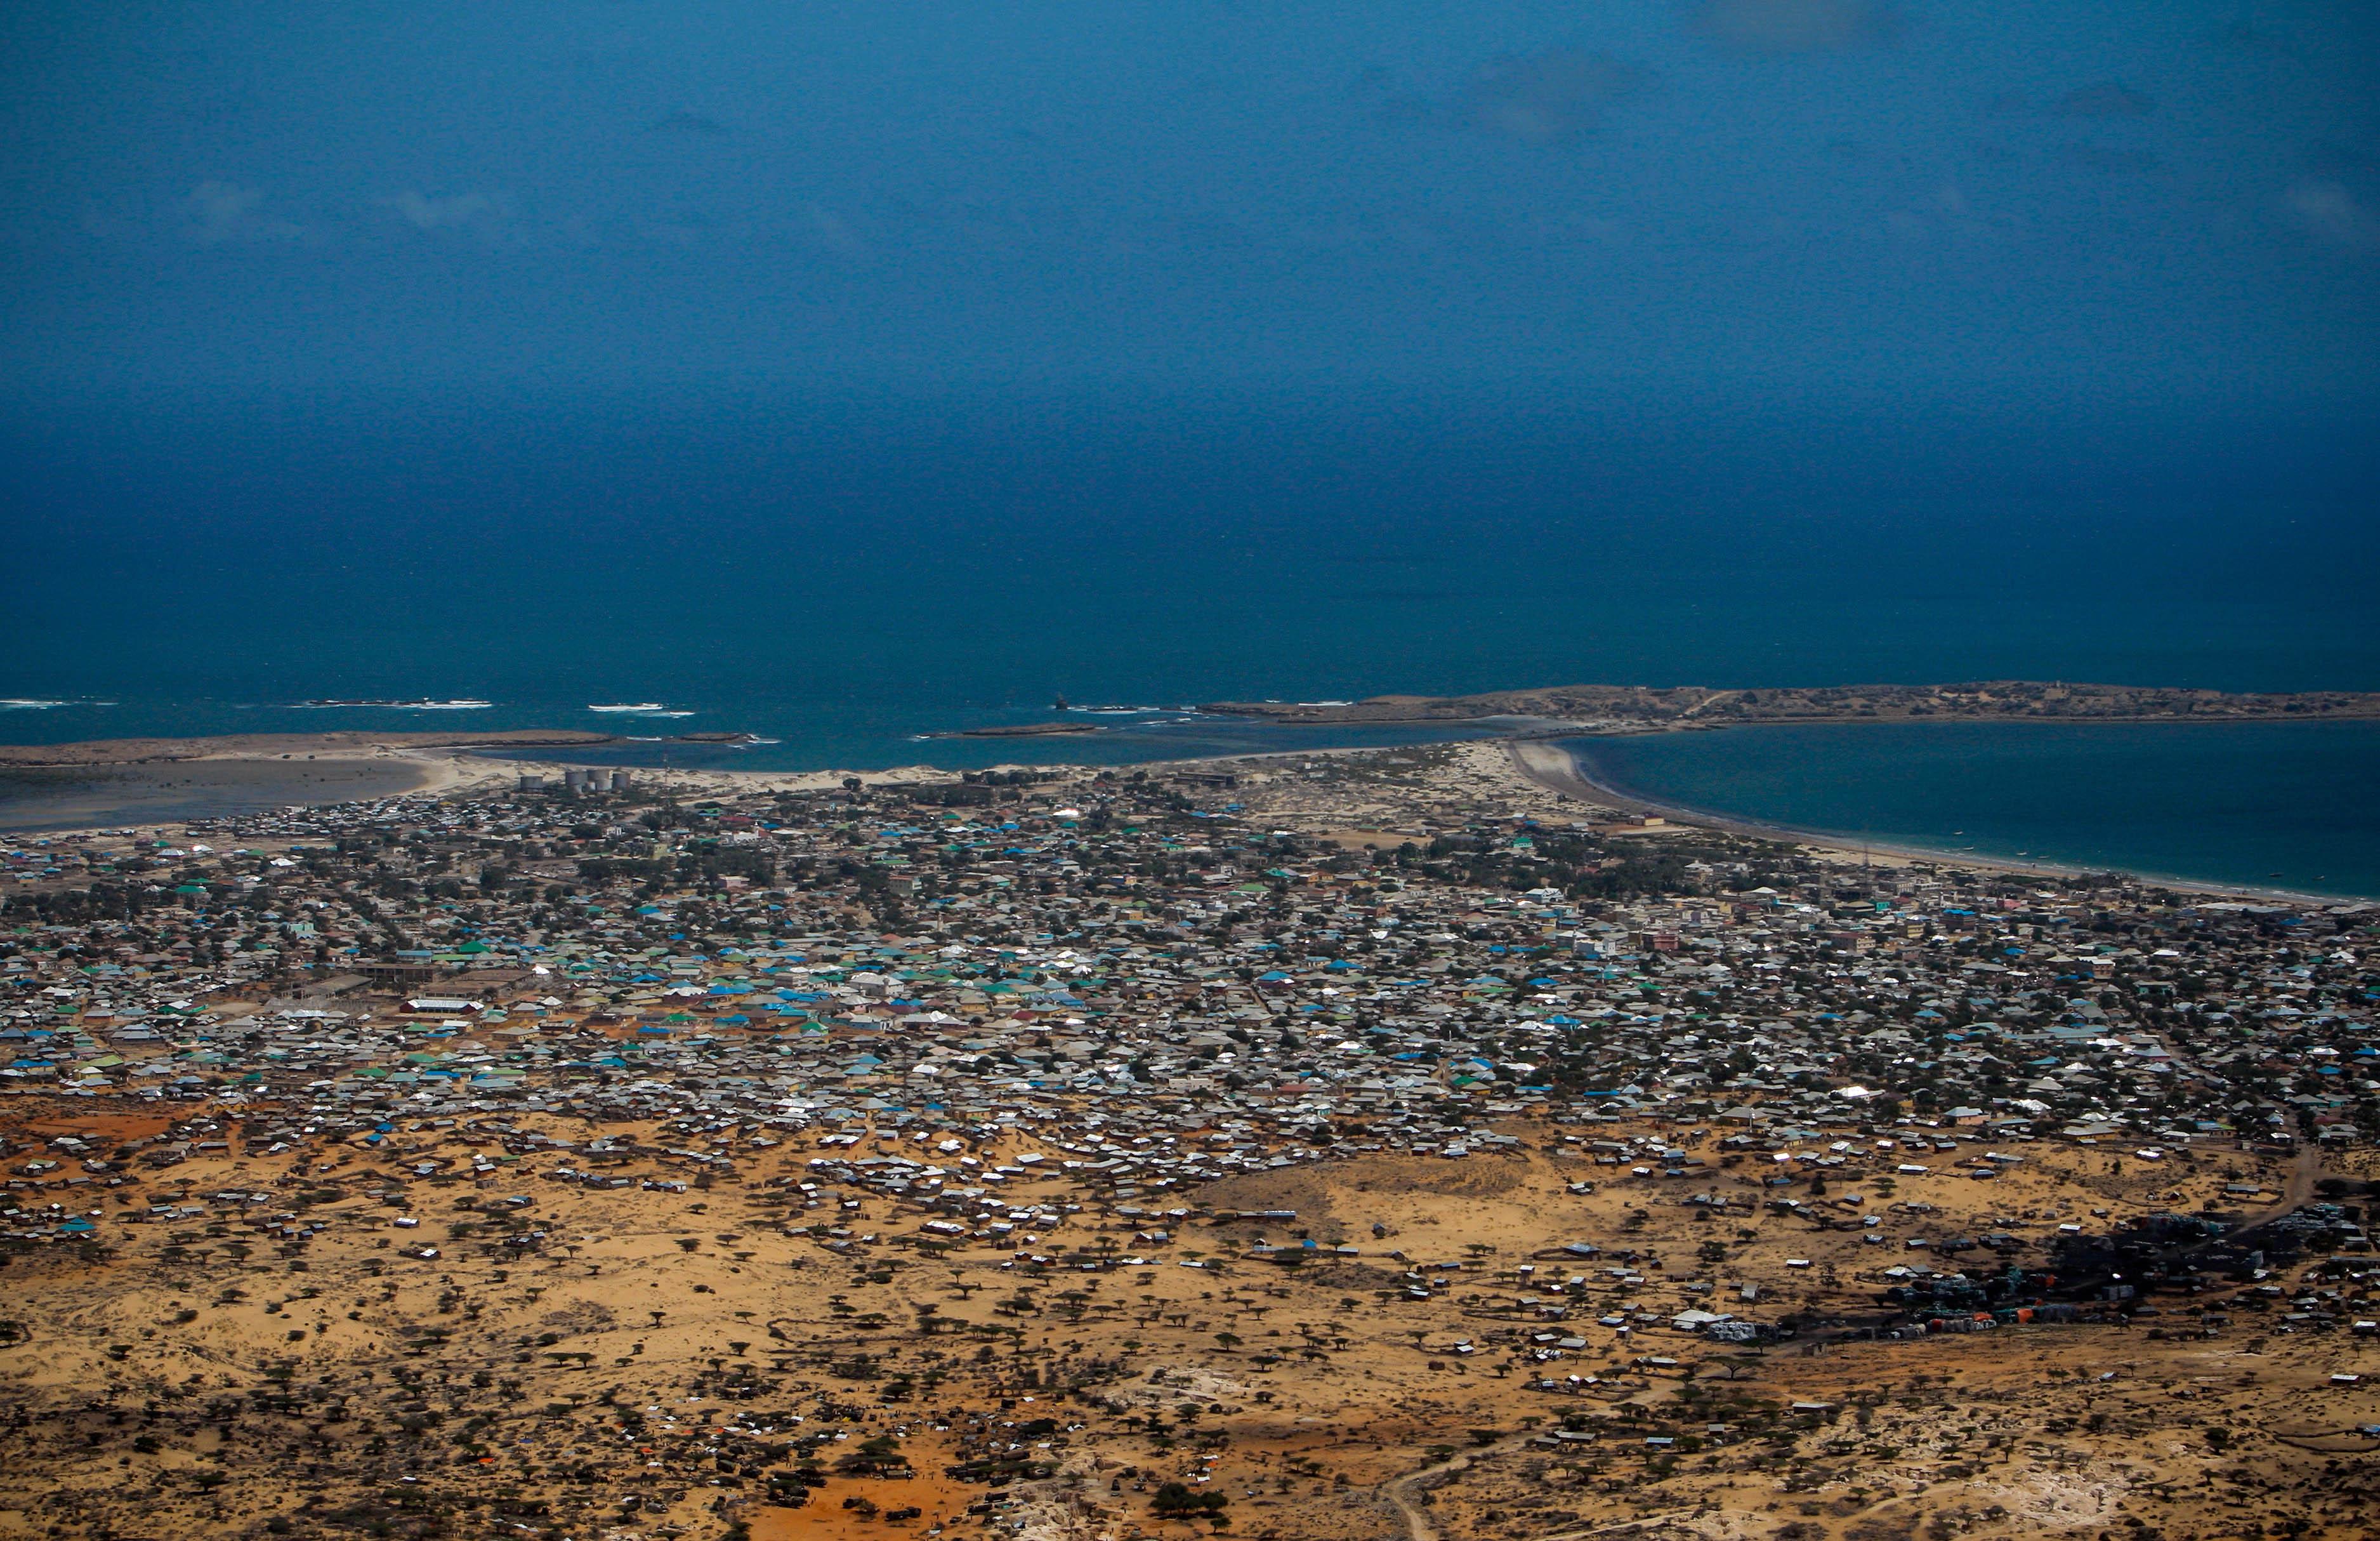 Kismayo – Travel guide at Wikivoyage